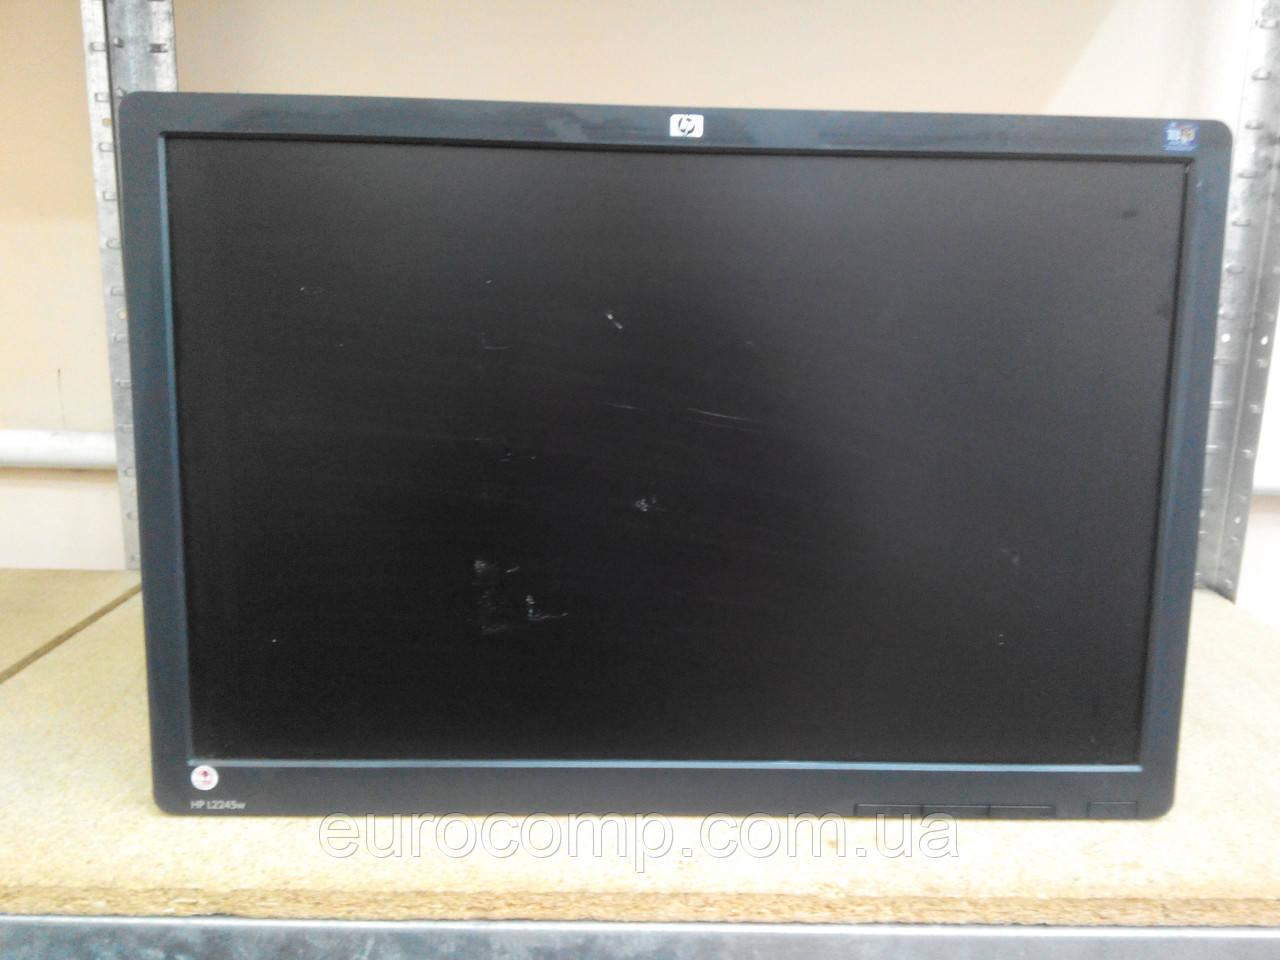 Монитор для работы, видеонаблюдения 22'' (HP L2245W) Уценка, без подставки, царапины на матрице